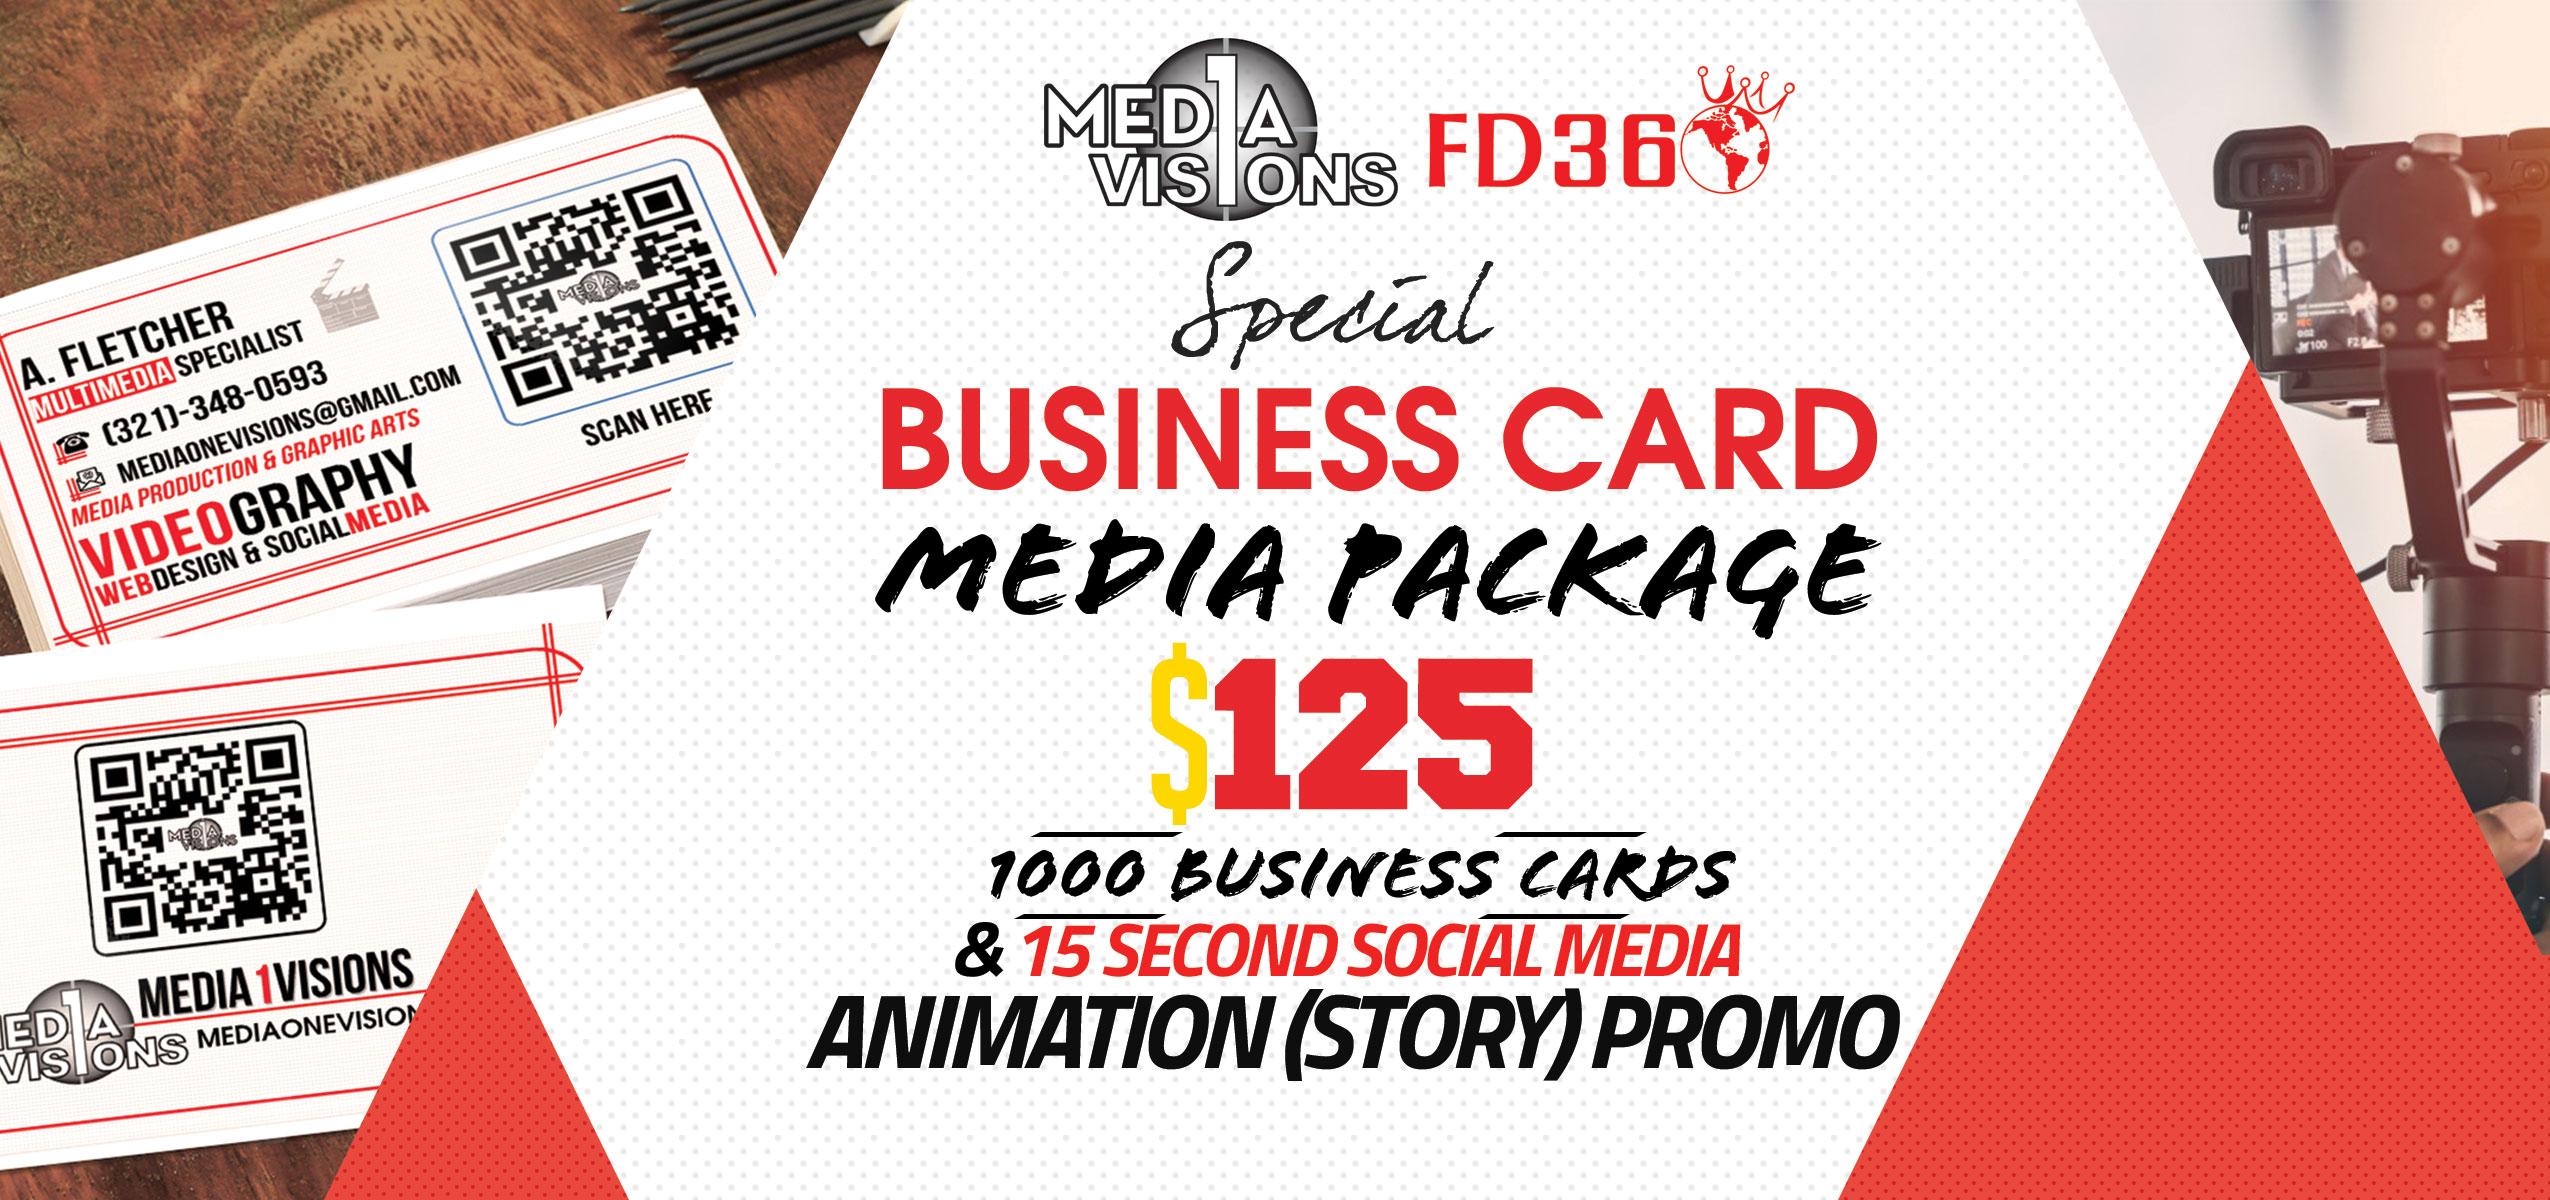 Business-Card-Media-Kit-Ad